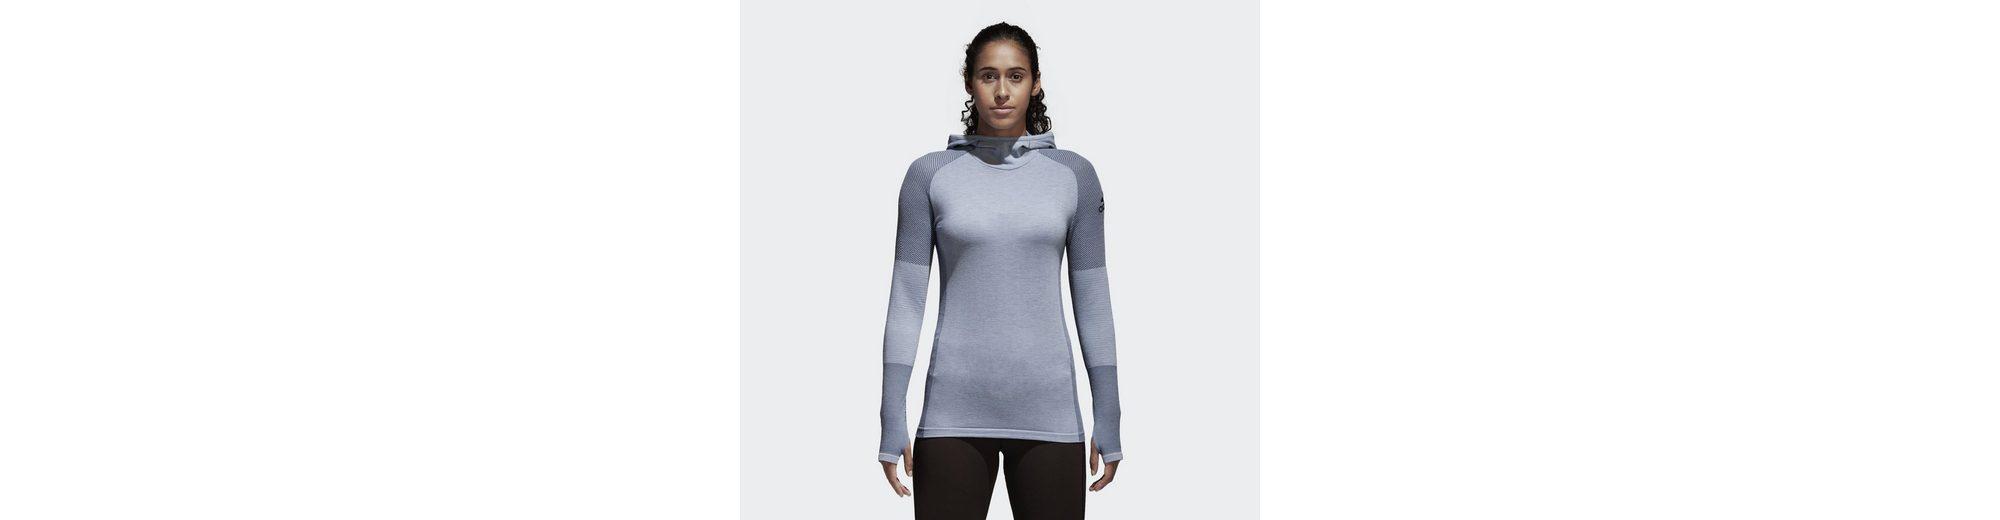 adidas Performance Sporttop Climaheat Primeknit Hooded Longsleeve Verkauf Wirklich Verkauf Perfekt Kaufen Mj3clVCFQS